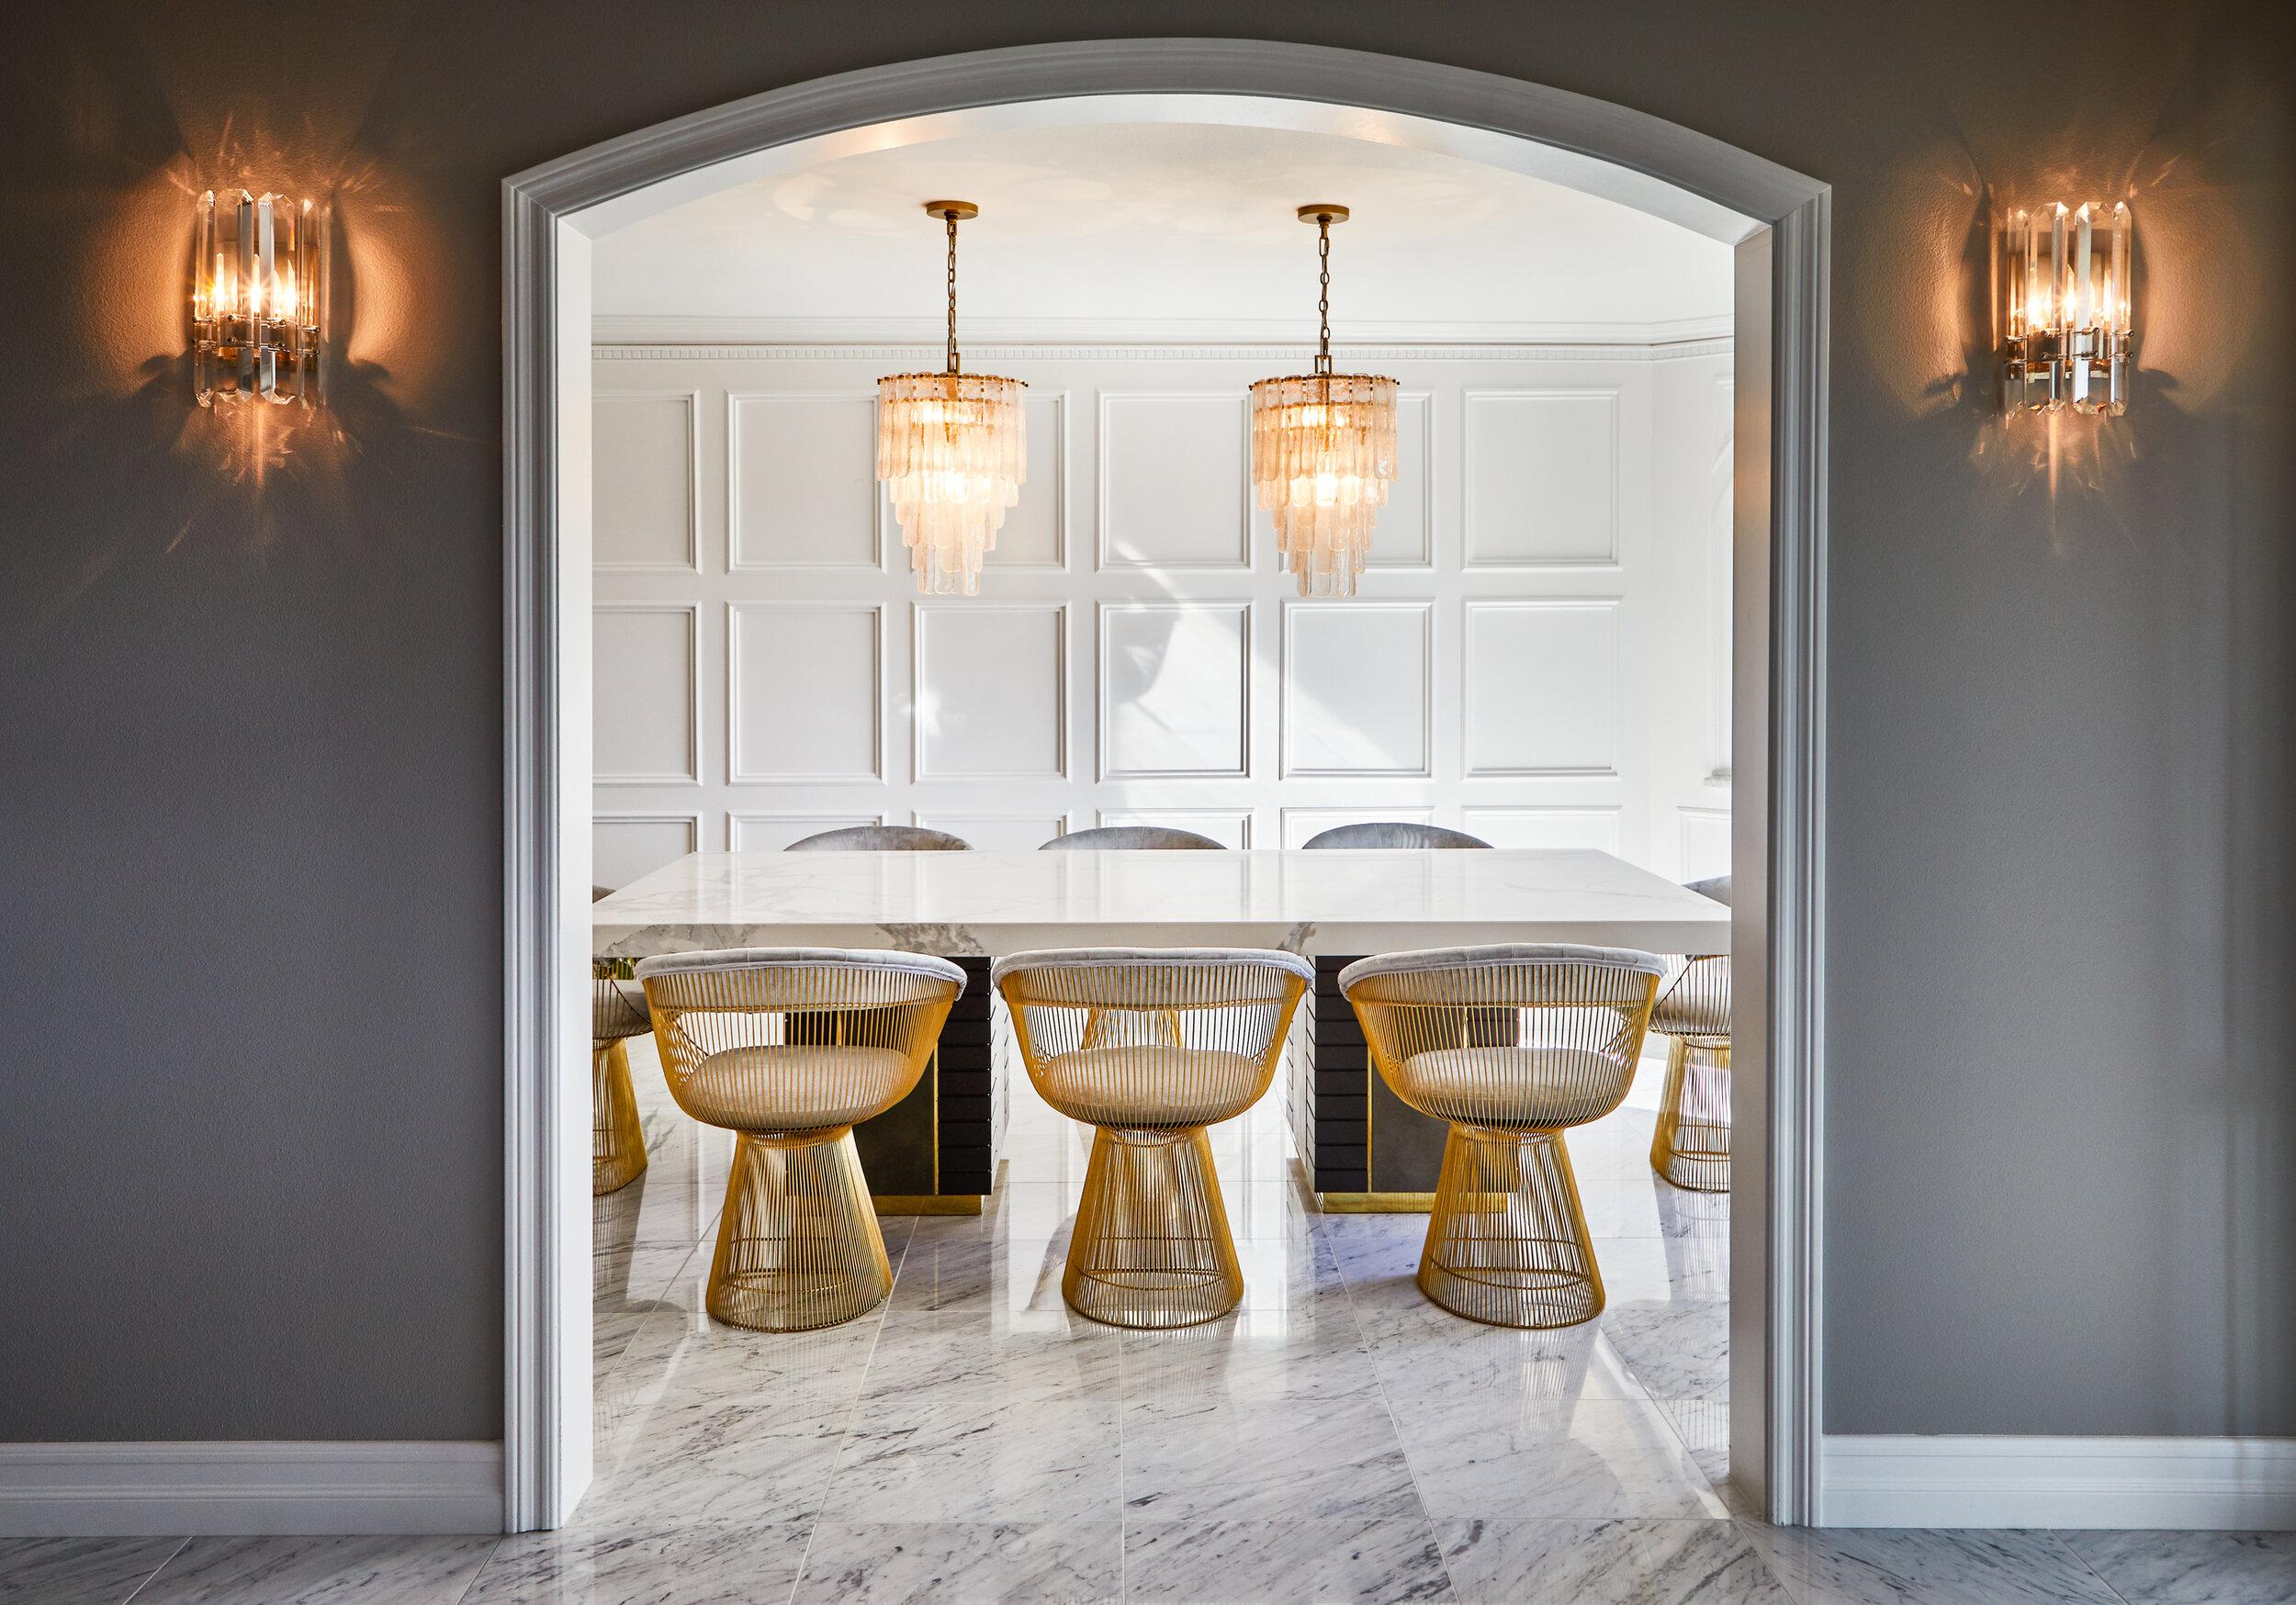 Zehana Interiors Interior Design Los Angeles Top Interior Designers Decorator